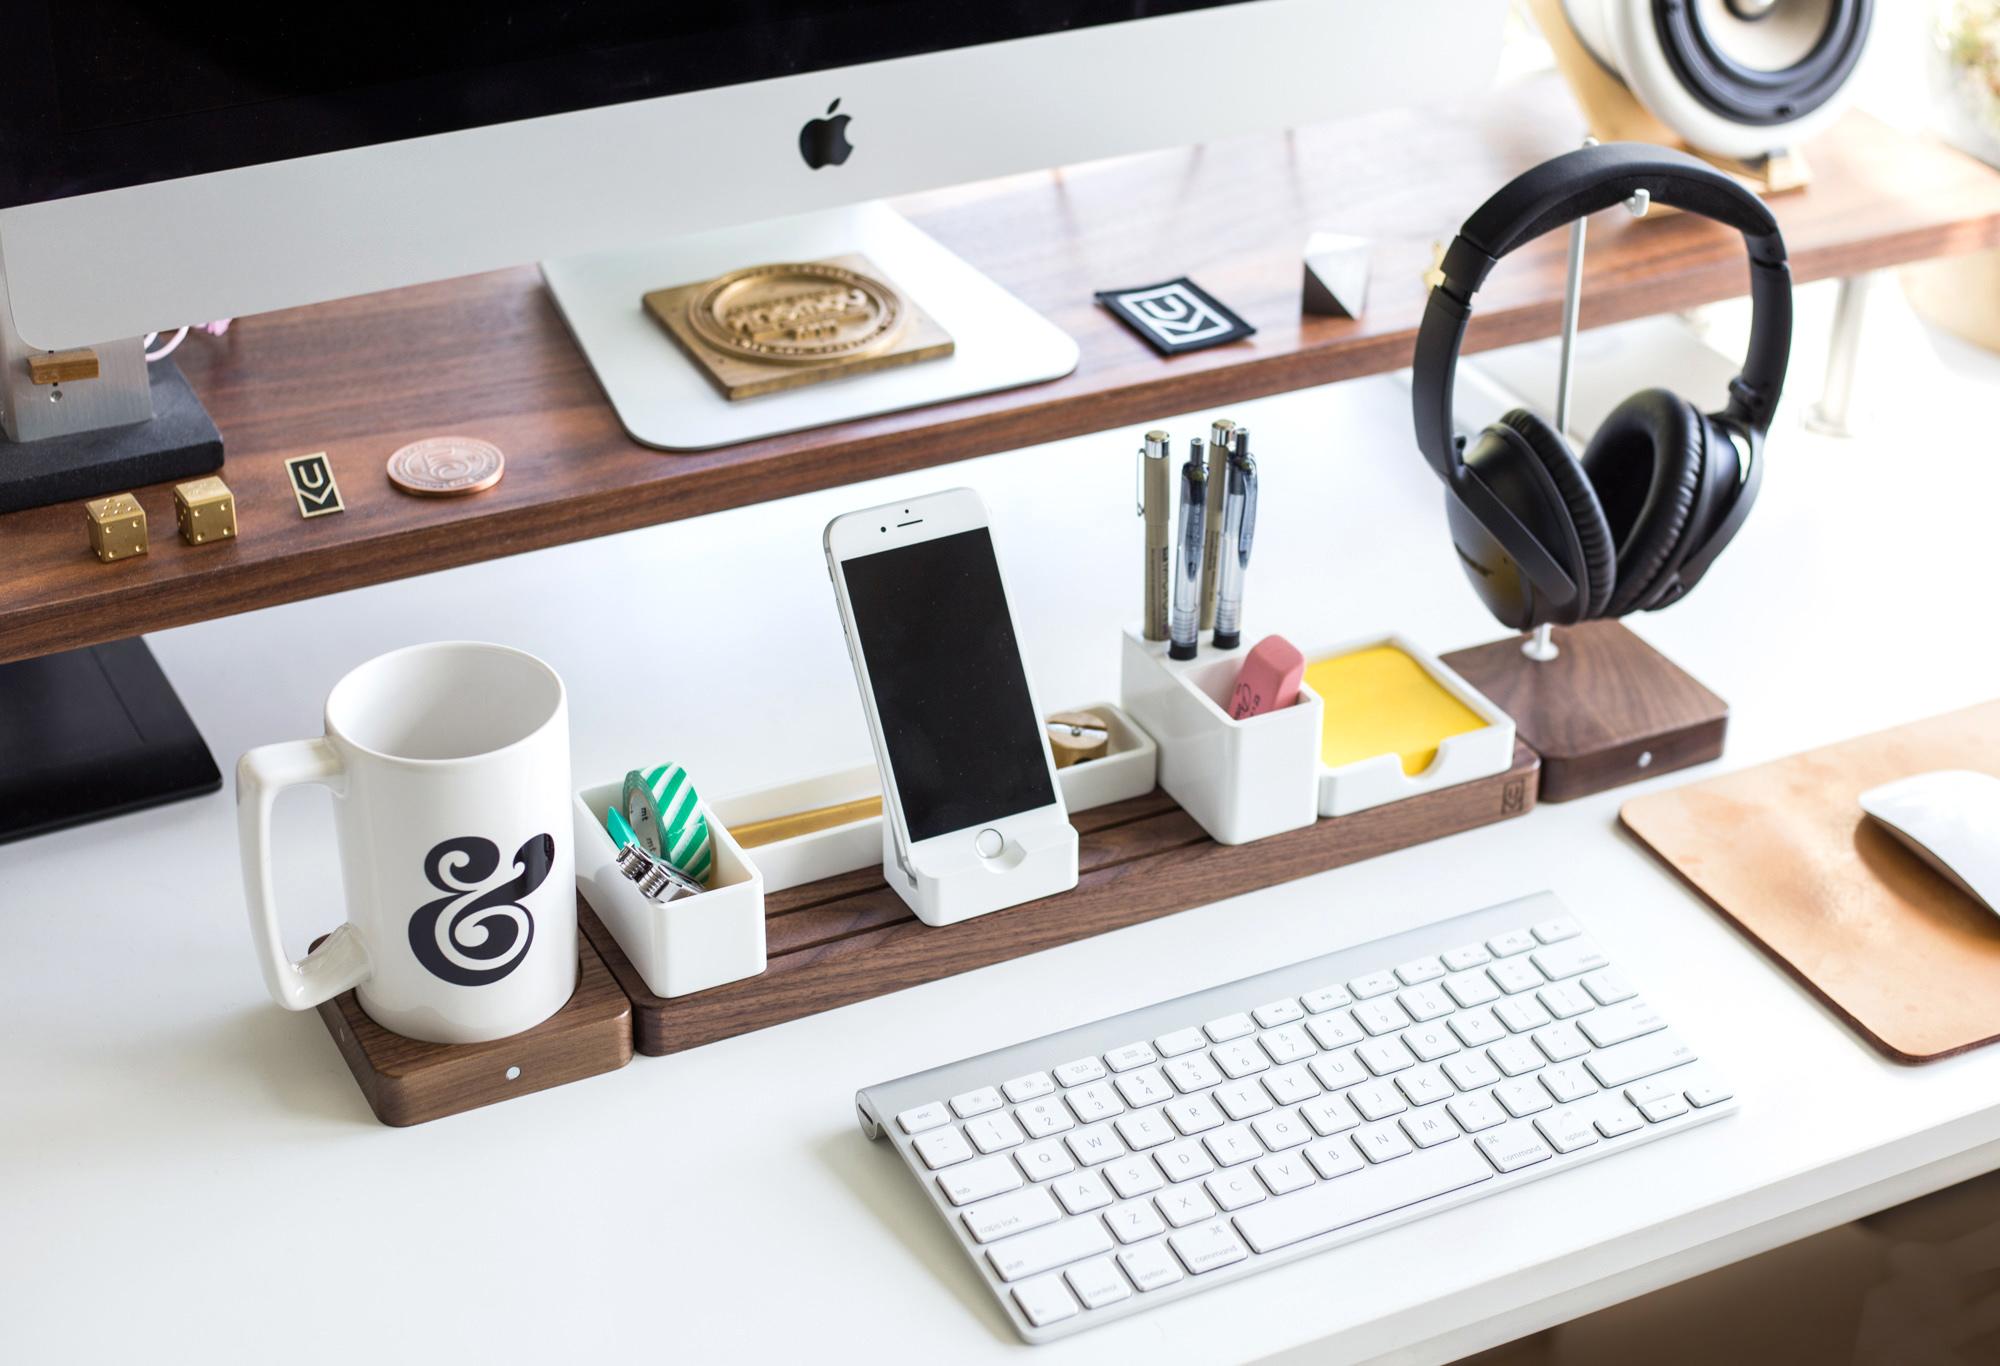 Gather by Ugmonk: Minimal & Modular, your Next Desk Organizer